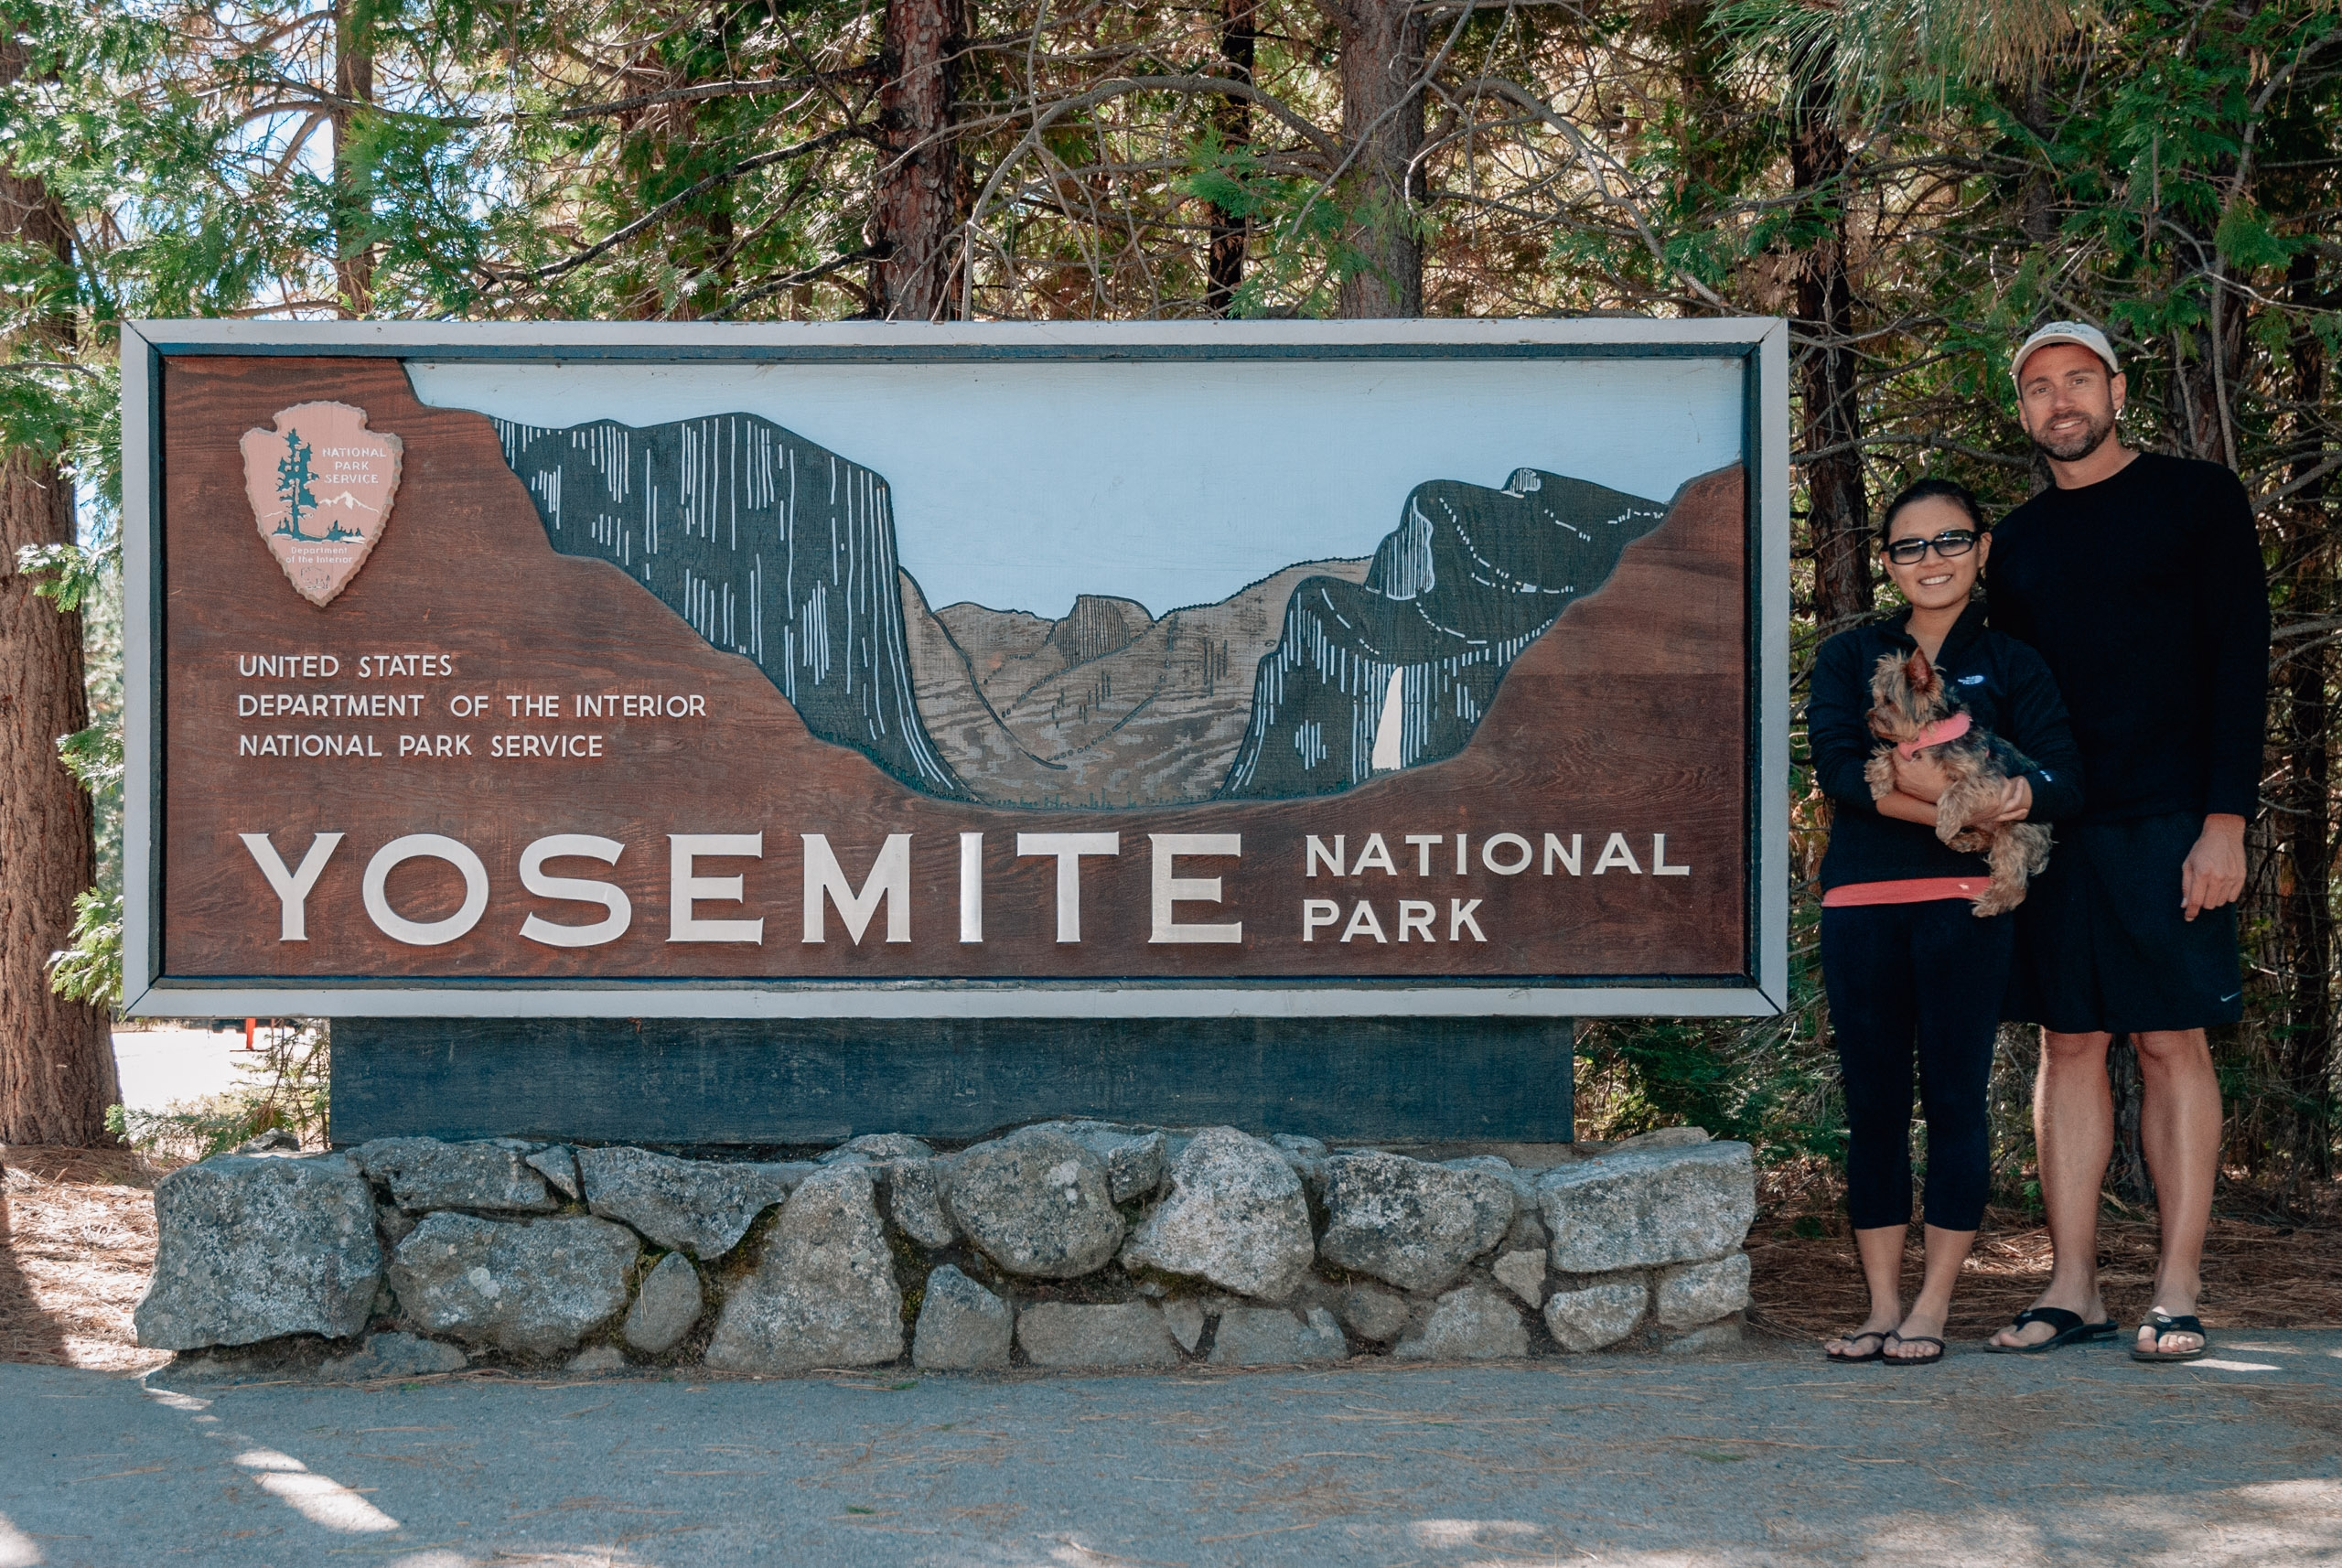 Yosemite National Park - 2007-1006-DSC_0084_53371